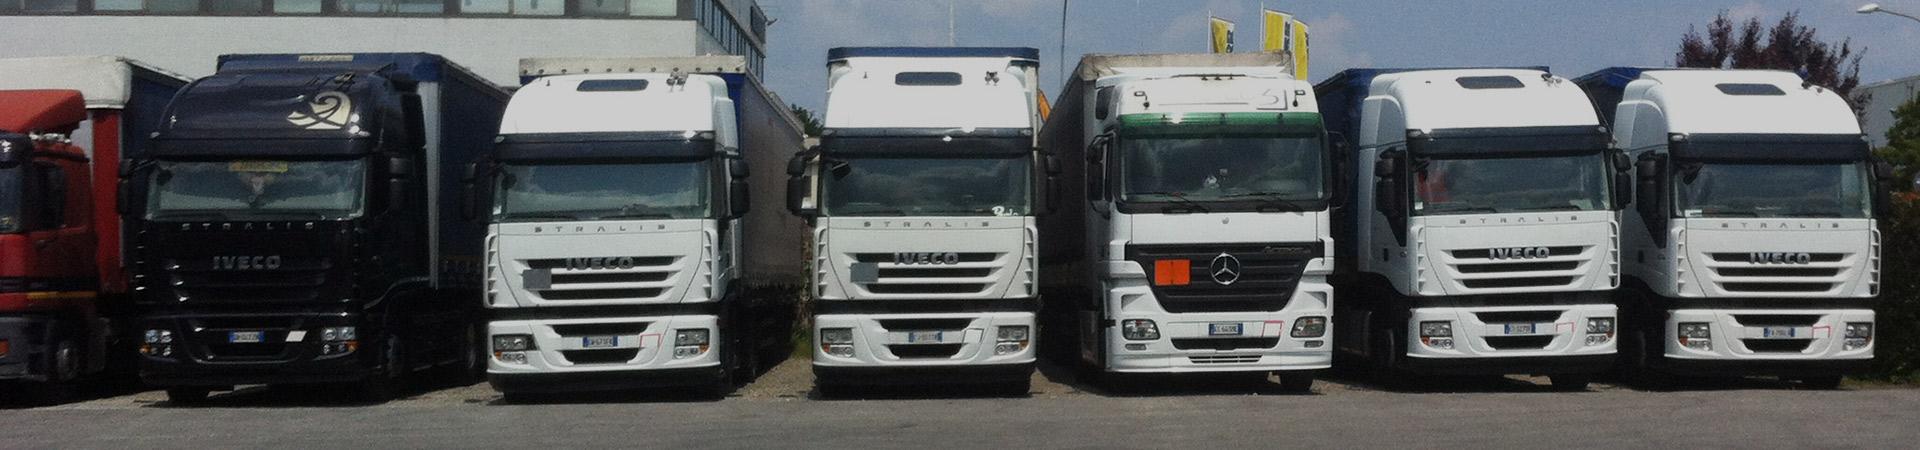 La flotta mezzi di Azzurra Trasporti